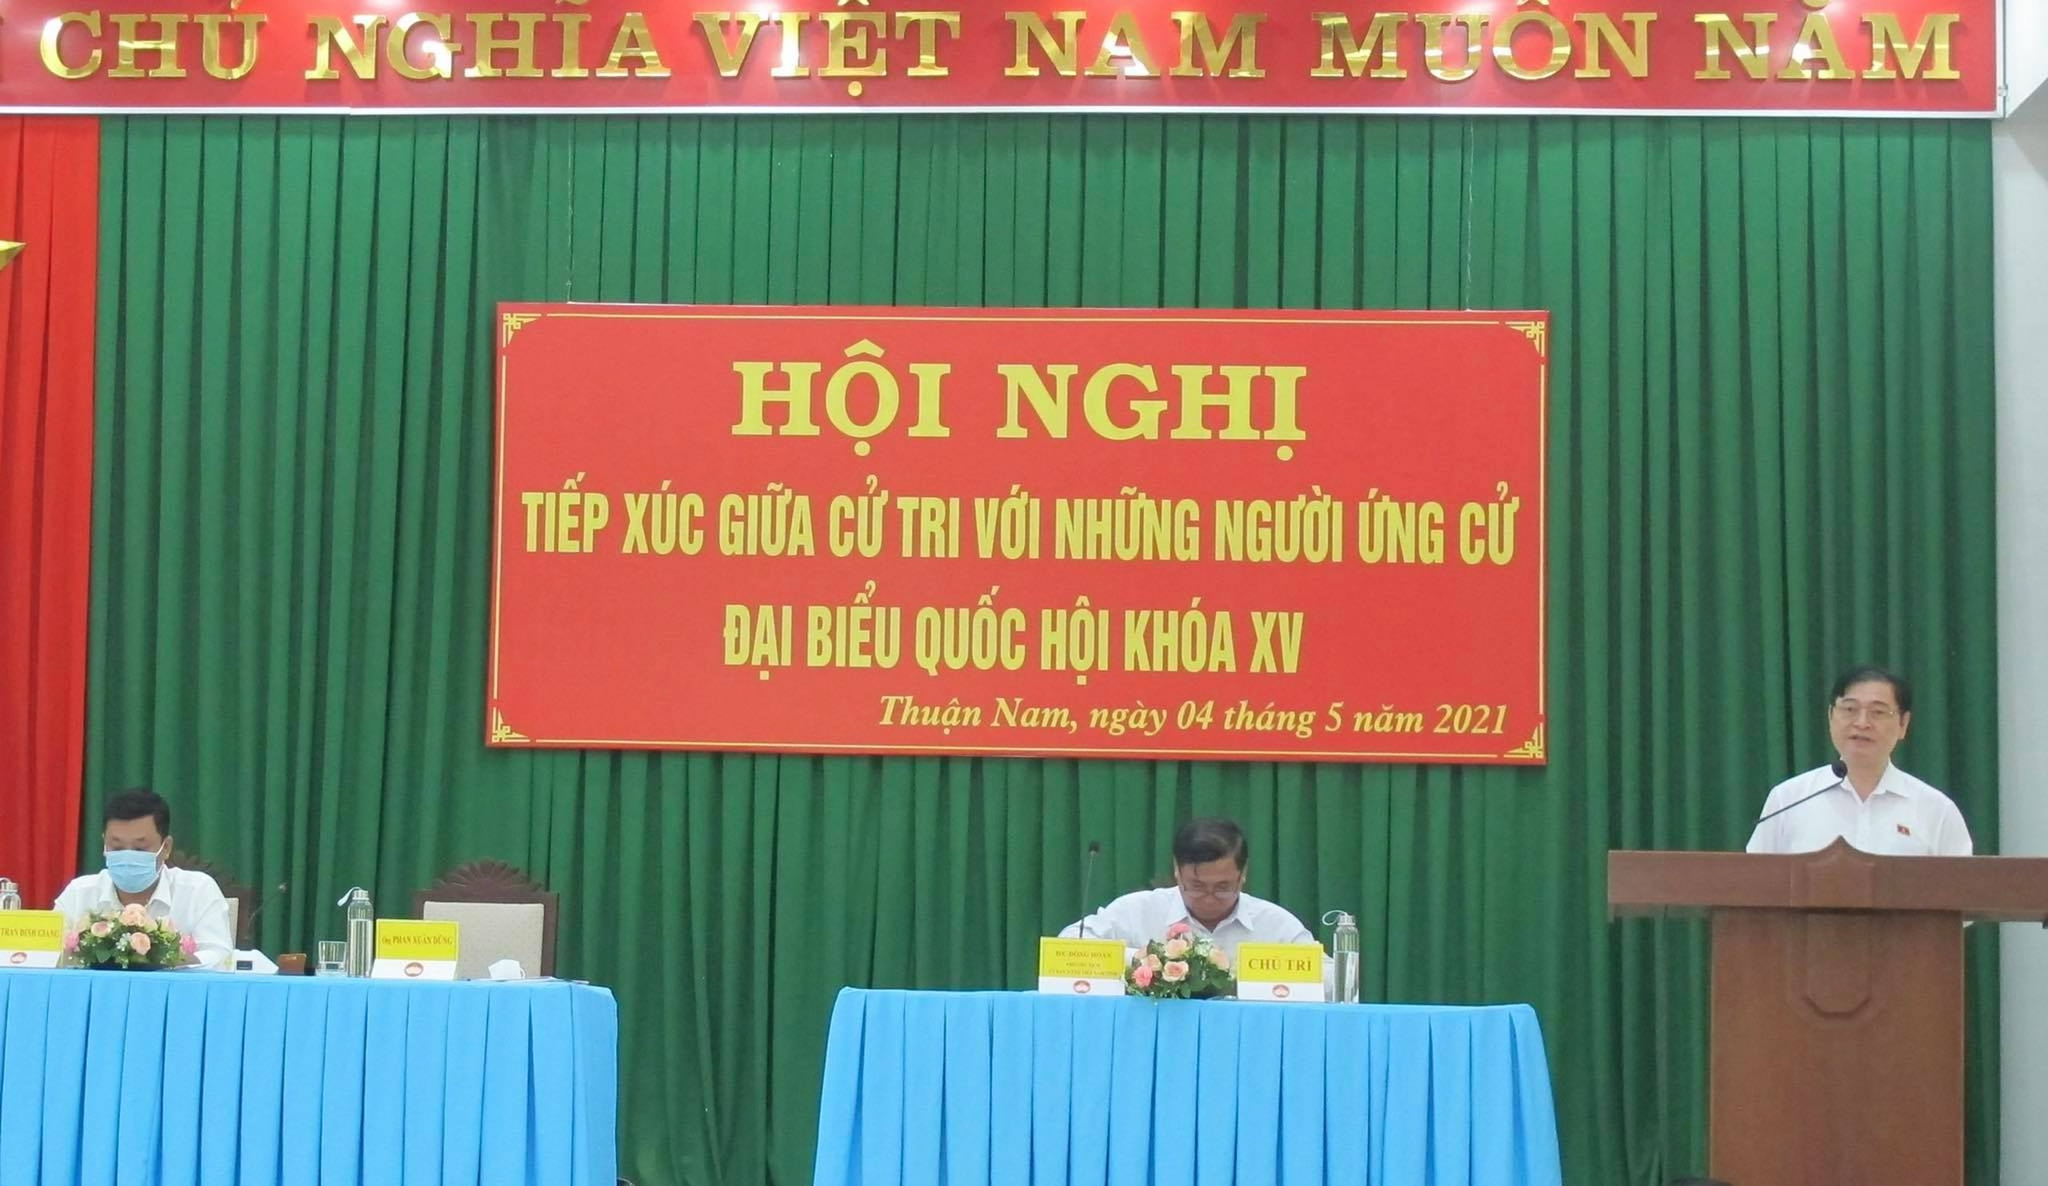 Chuong trinh van dong bau cu cua ung vien DBQH - Chu tich VUSTA Phan Xuan Dung-Hinh-2